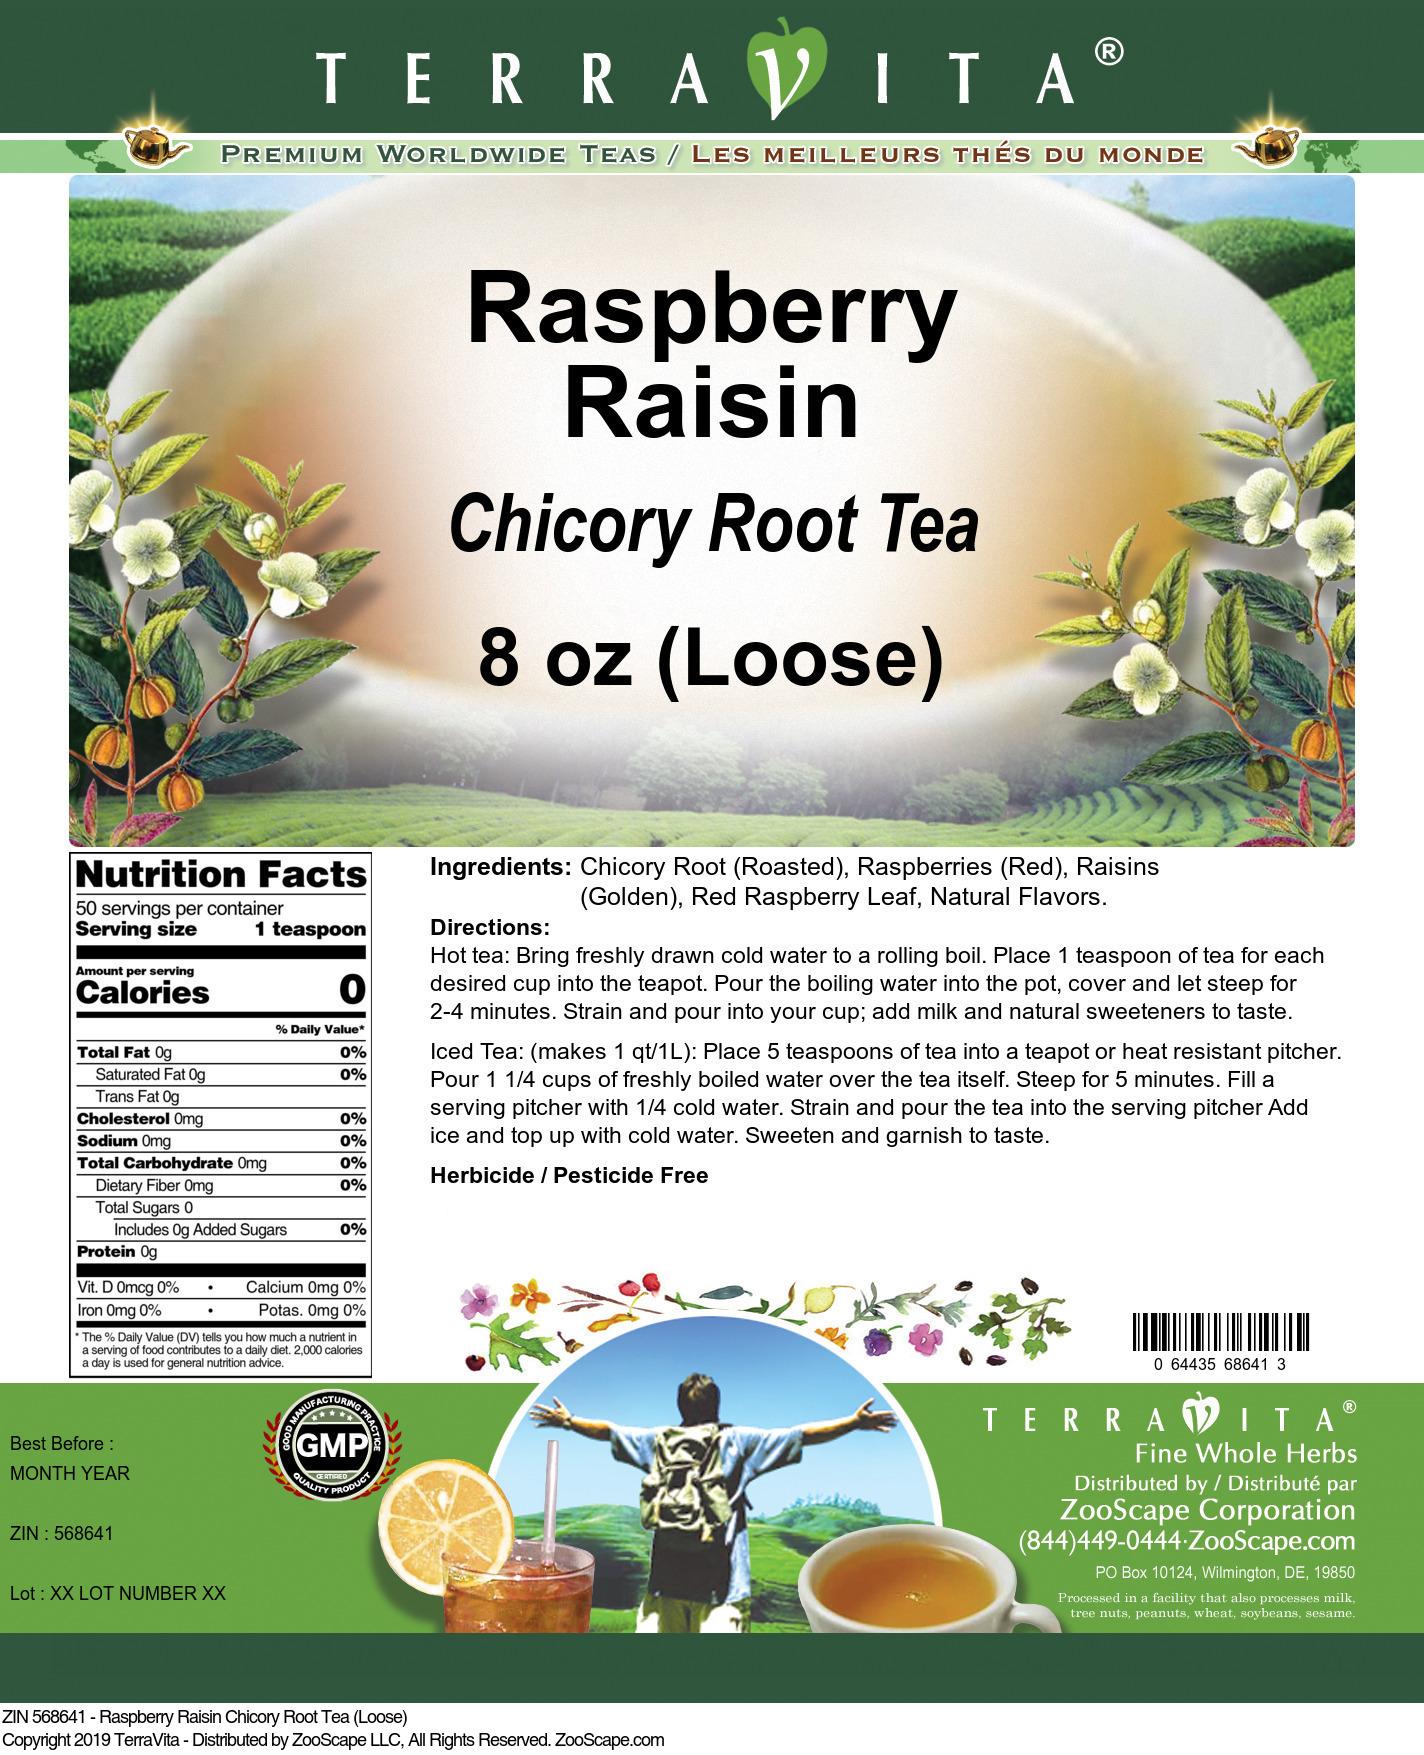 Raspberry Raisin Chicory Root Tea (Loose)